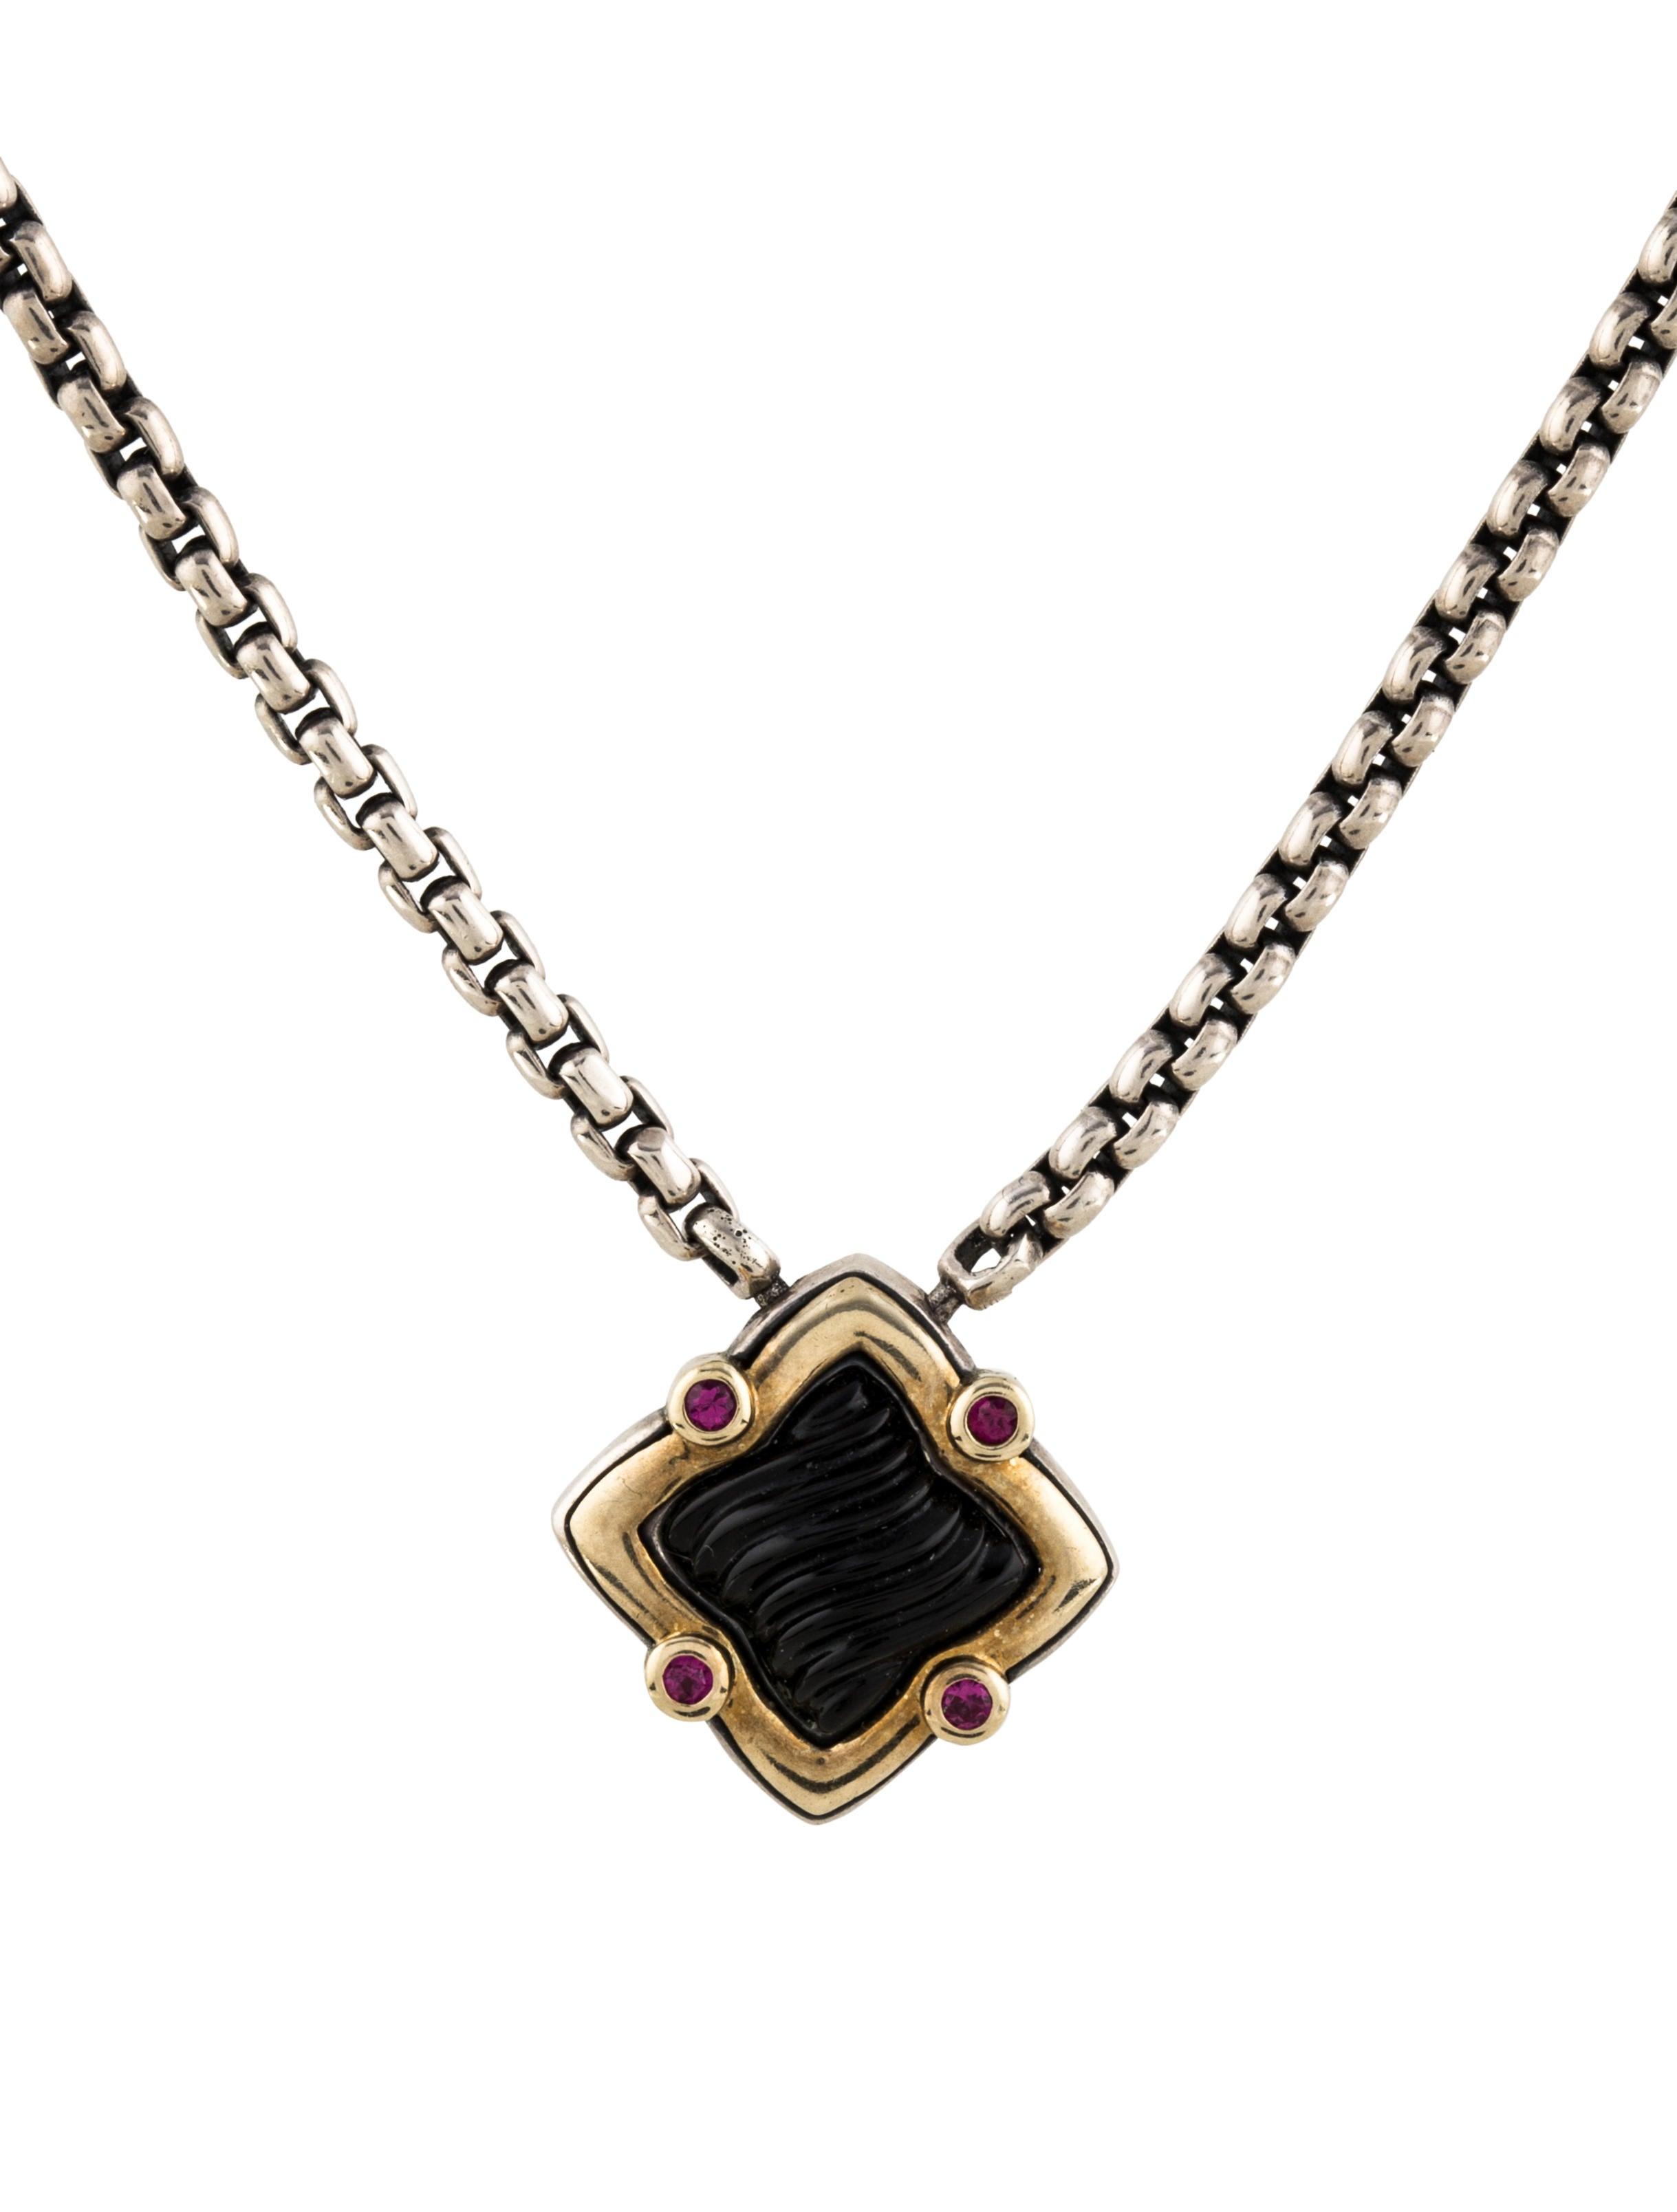 David Yurman Onyx & Ruby Quatrefoil Pendant Necklace. Honey Rings. Sofa Diamond. Libra Pendant. Round Pearls. Colored Stone Bracelet. Unicorn Pendant. Tribal Wedding Rings. Safe Bands